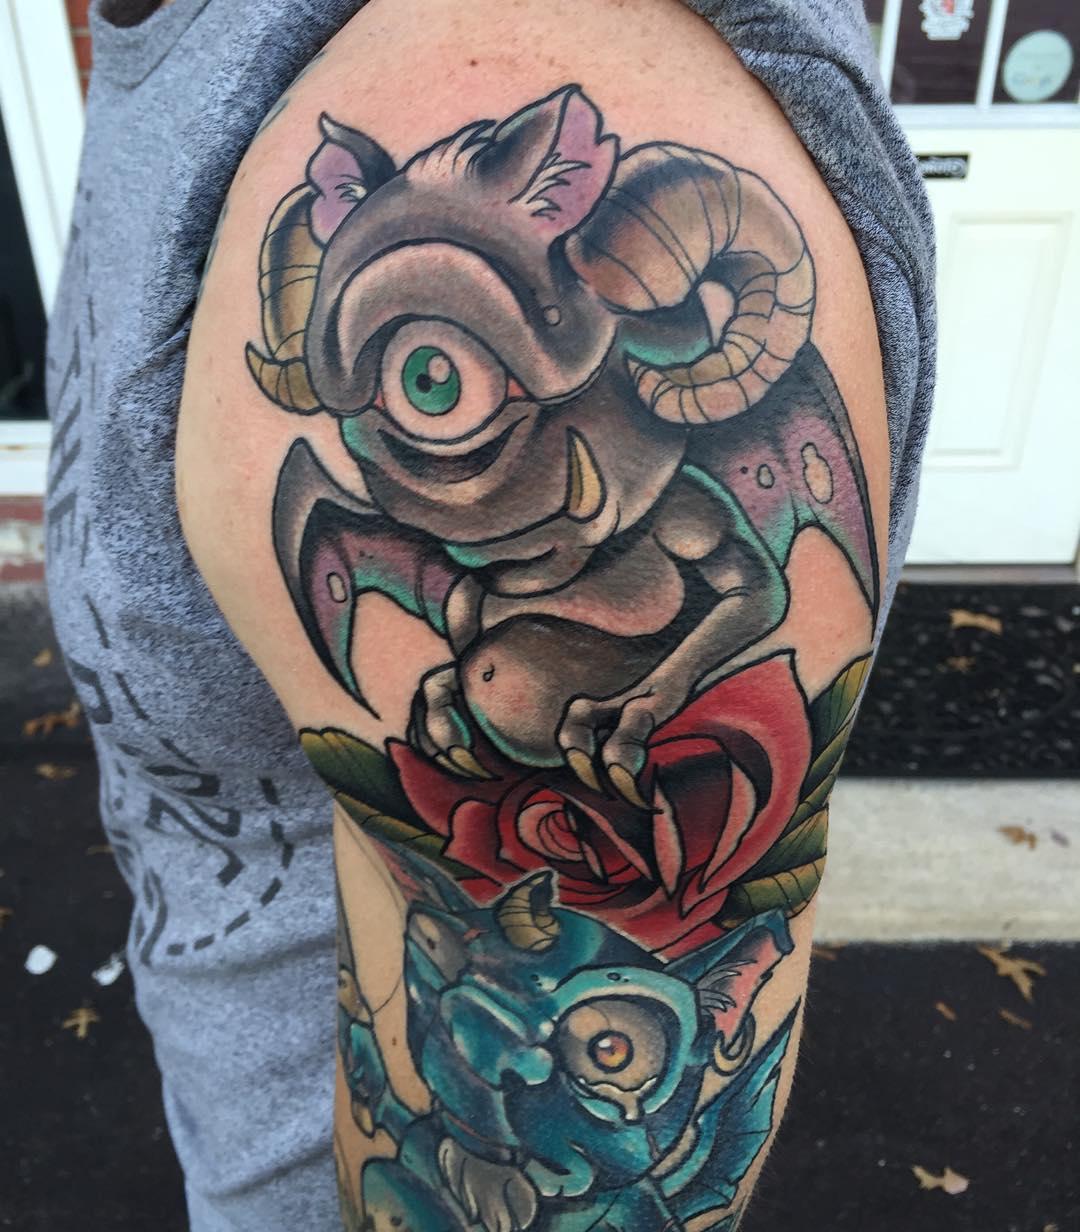 one-eyed new school imp tattoo on shoulder